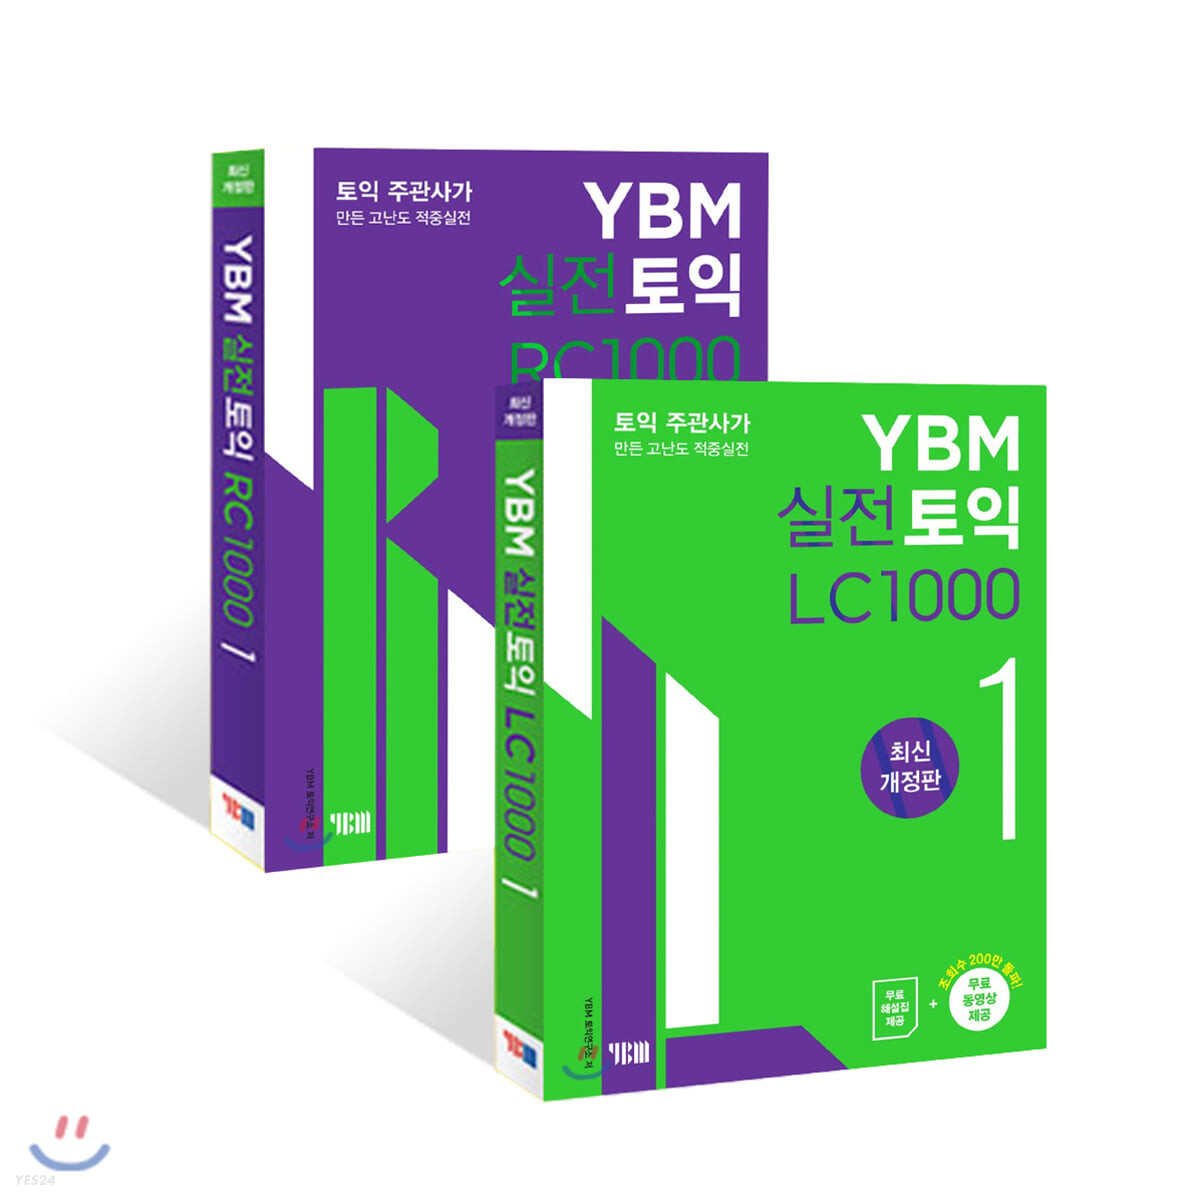 YBM 실전토익 LC 1000 1 + RC 1000 1